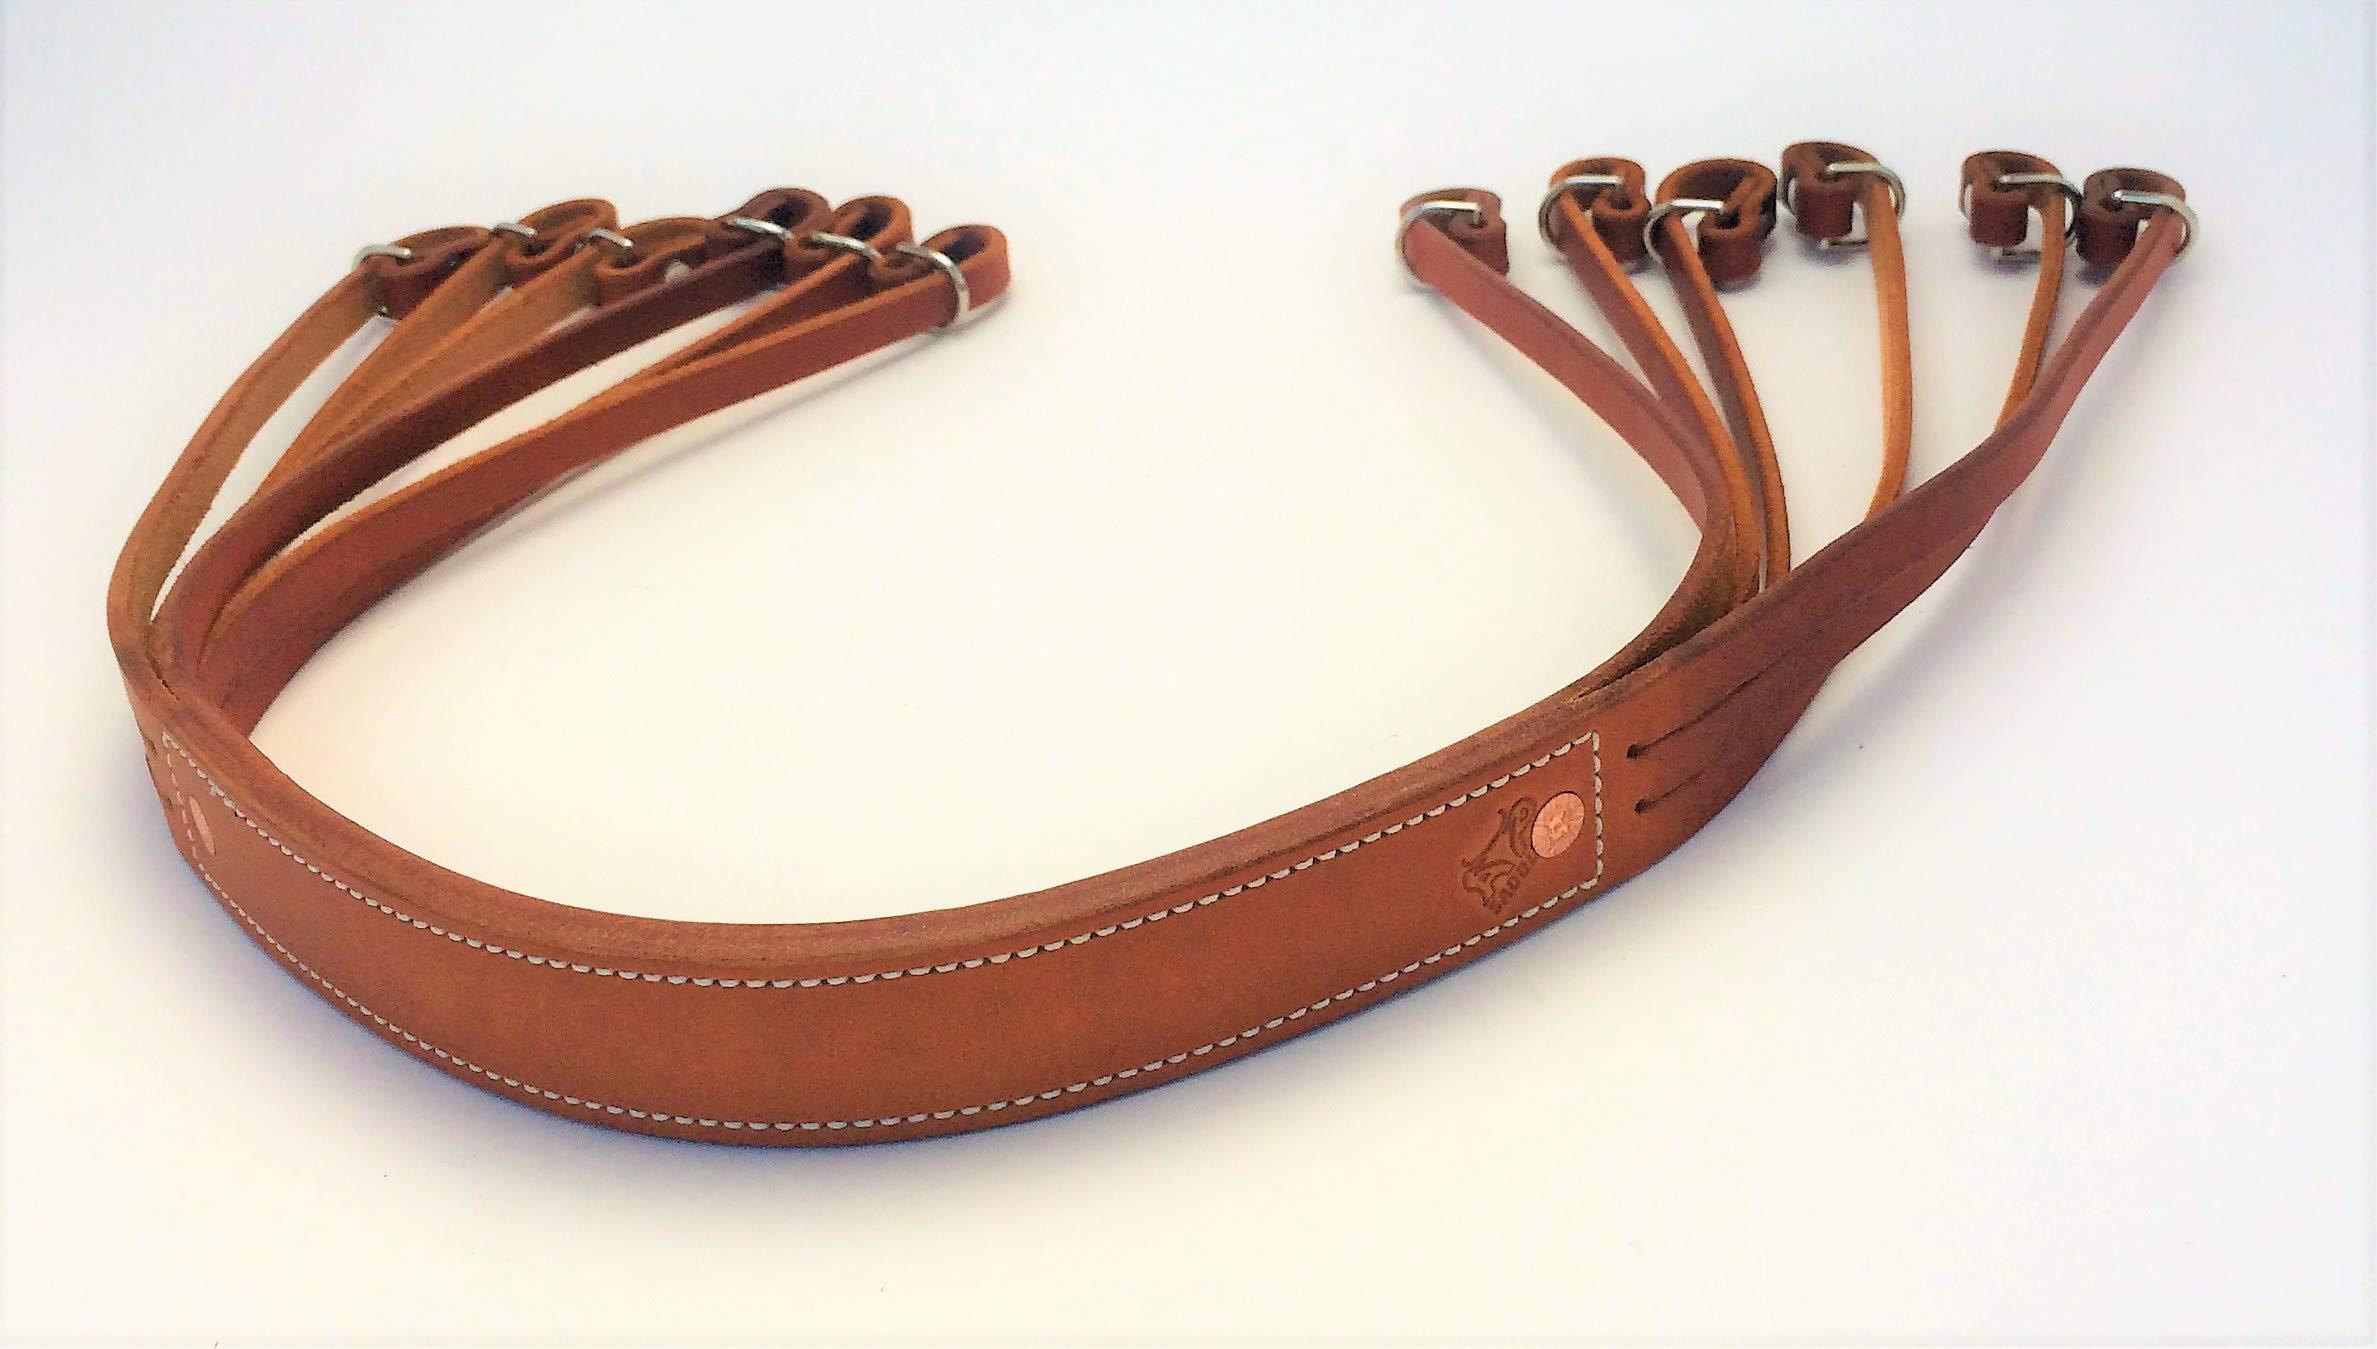 AP Saddlery Low Profile Leather Duck Strap (Saddle Tan)